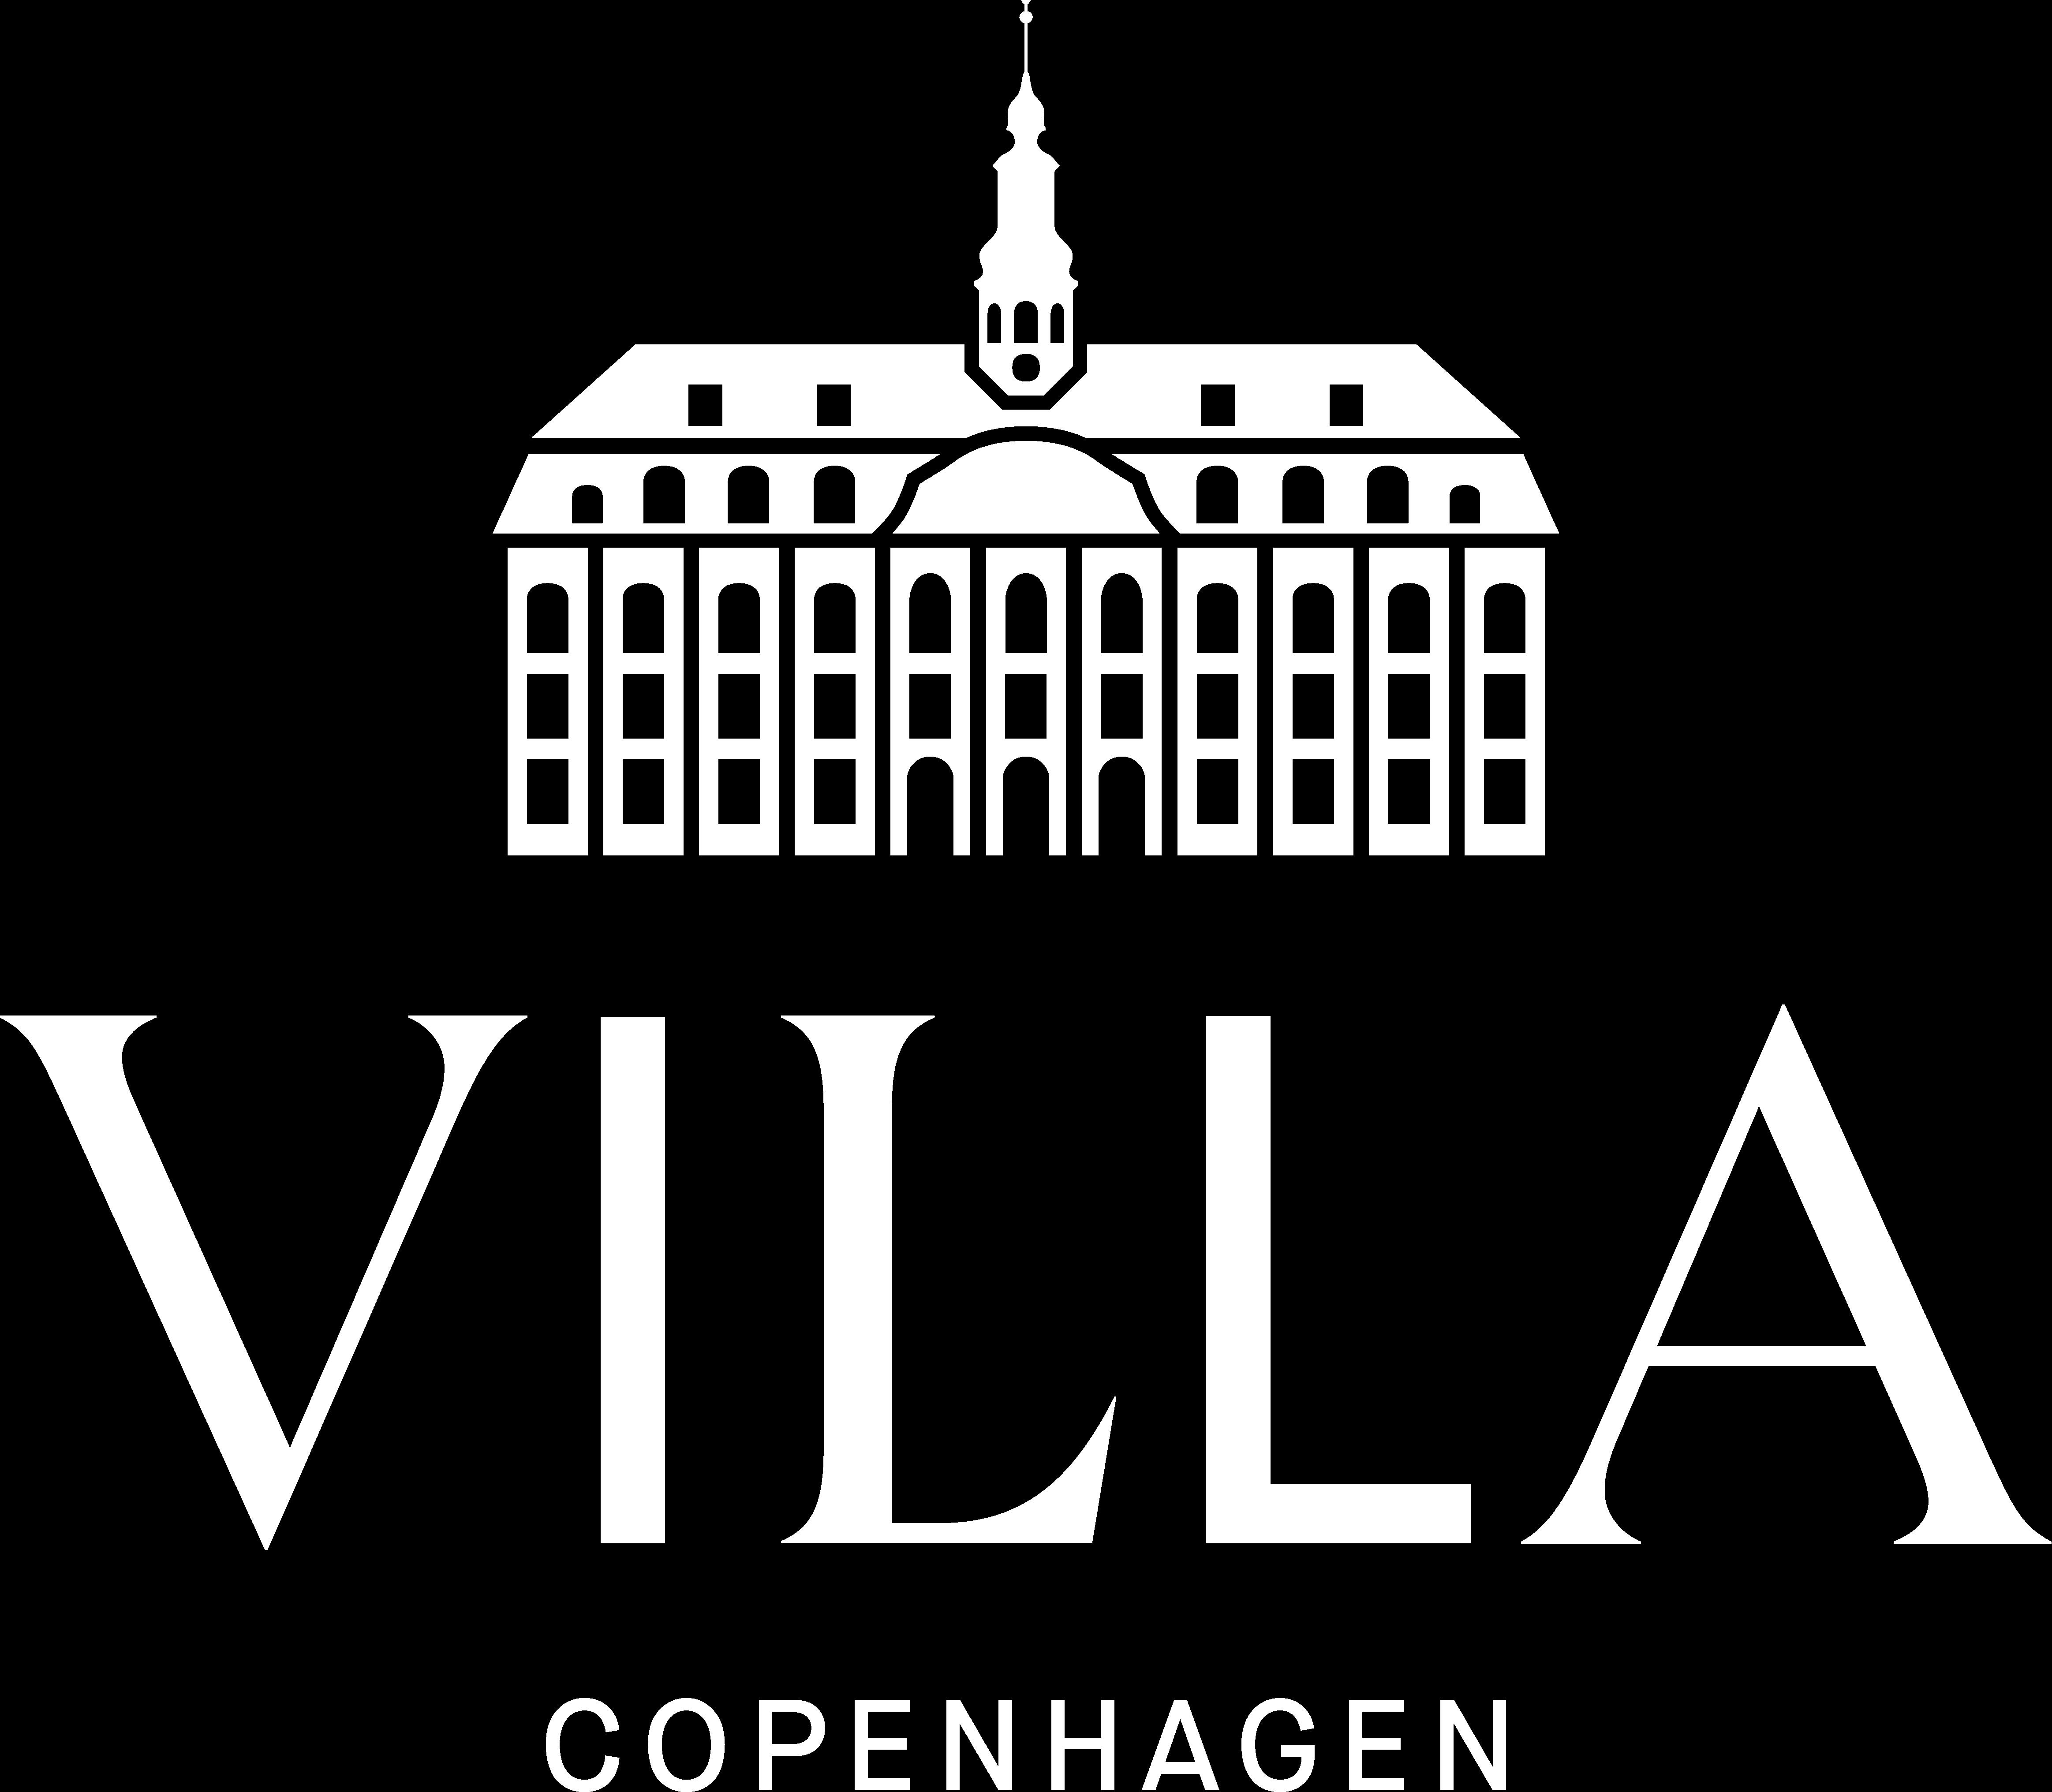 logo-white-on-black-copy